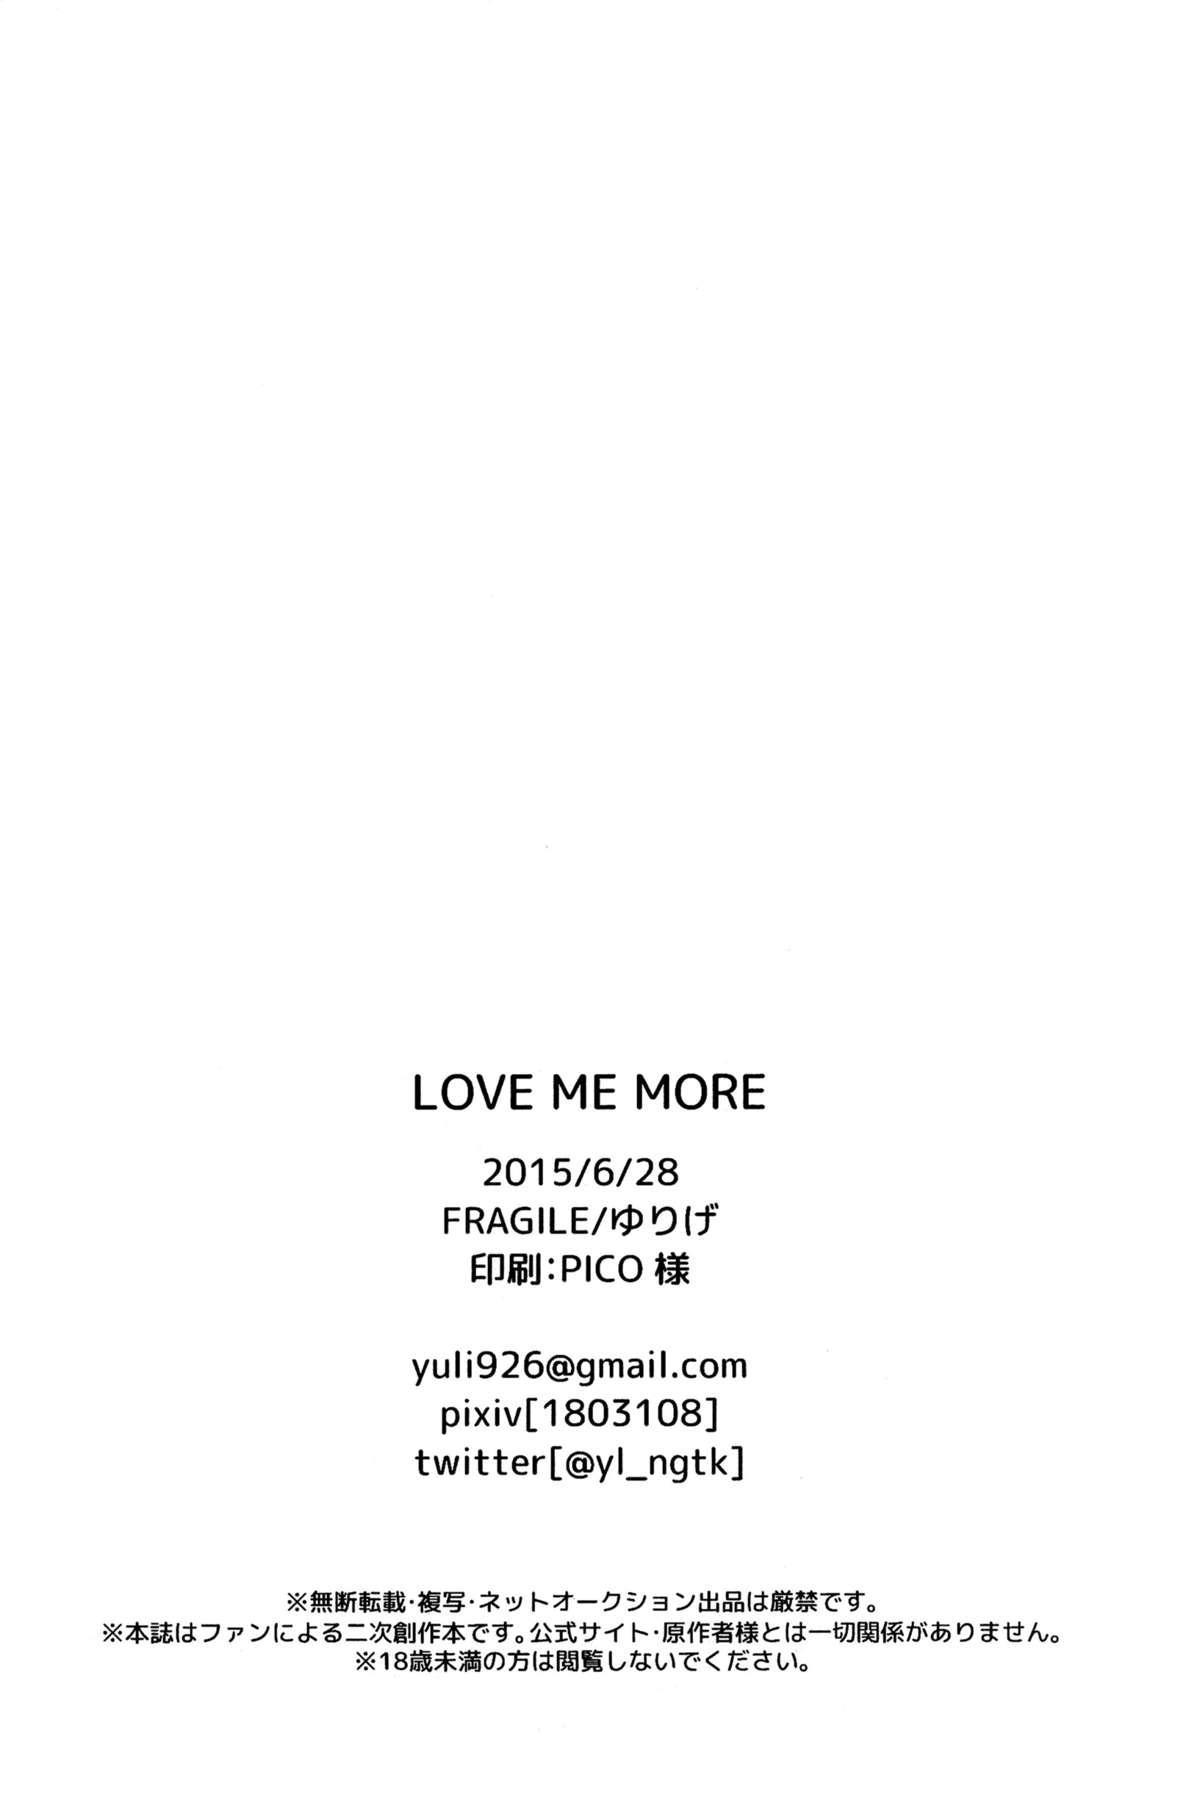 LOVE ME MORE 19